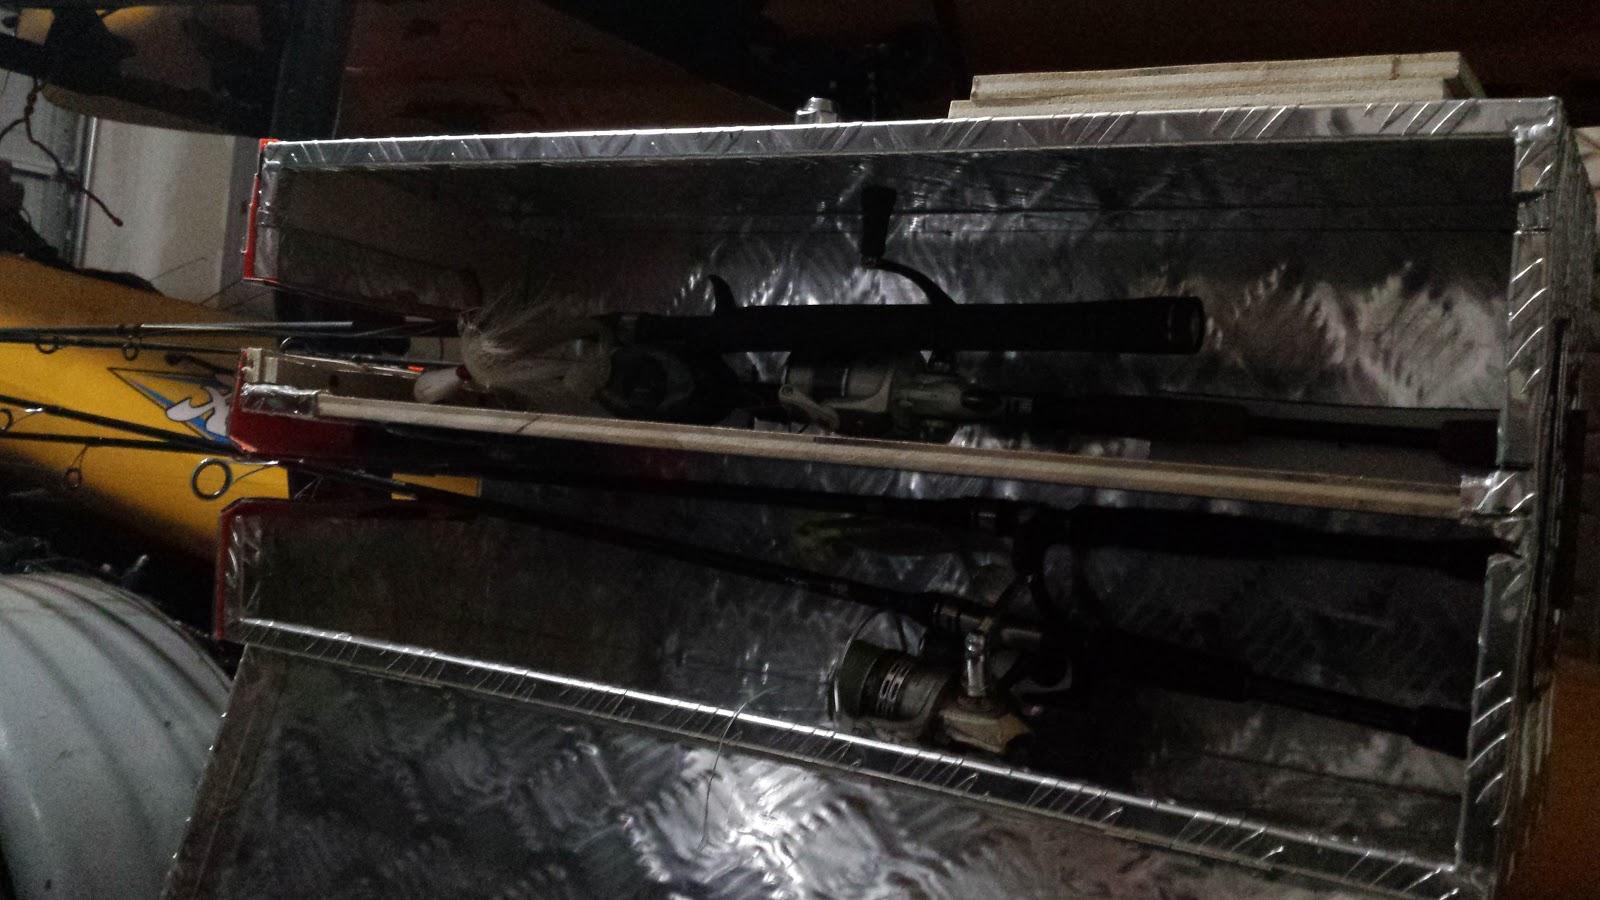 Fishxscale Diy Locking Rod Transport For A Kayak Trailer